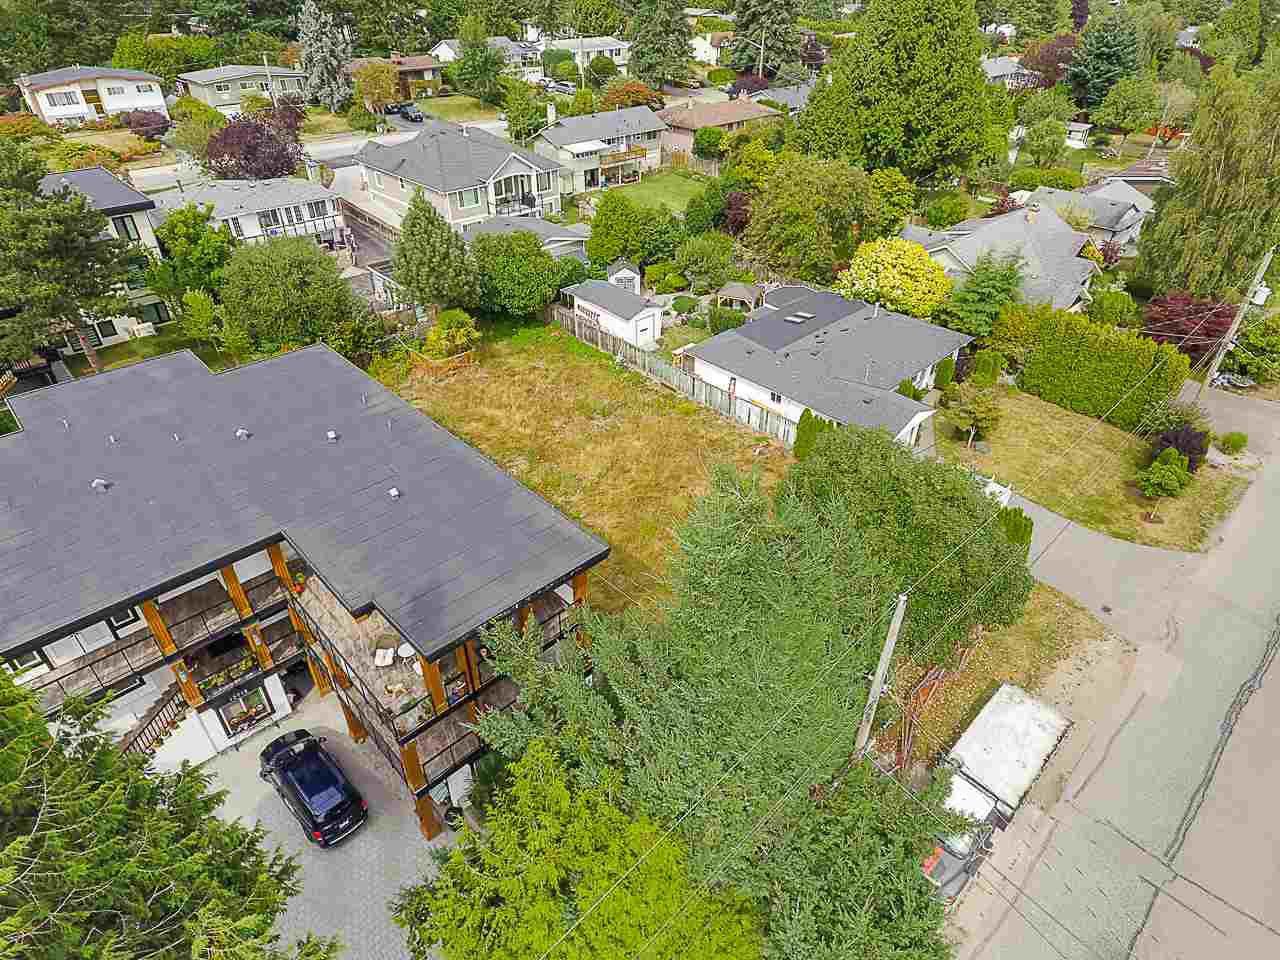 Main Photo: 13725 BLACKBURN Avenue: White Rock Land for sale (South Surrey White Rock)  : MLS®# R2435678